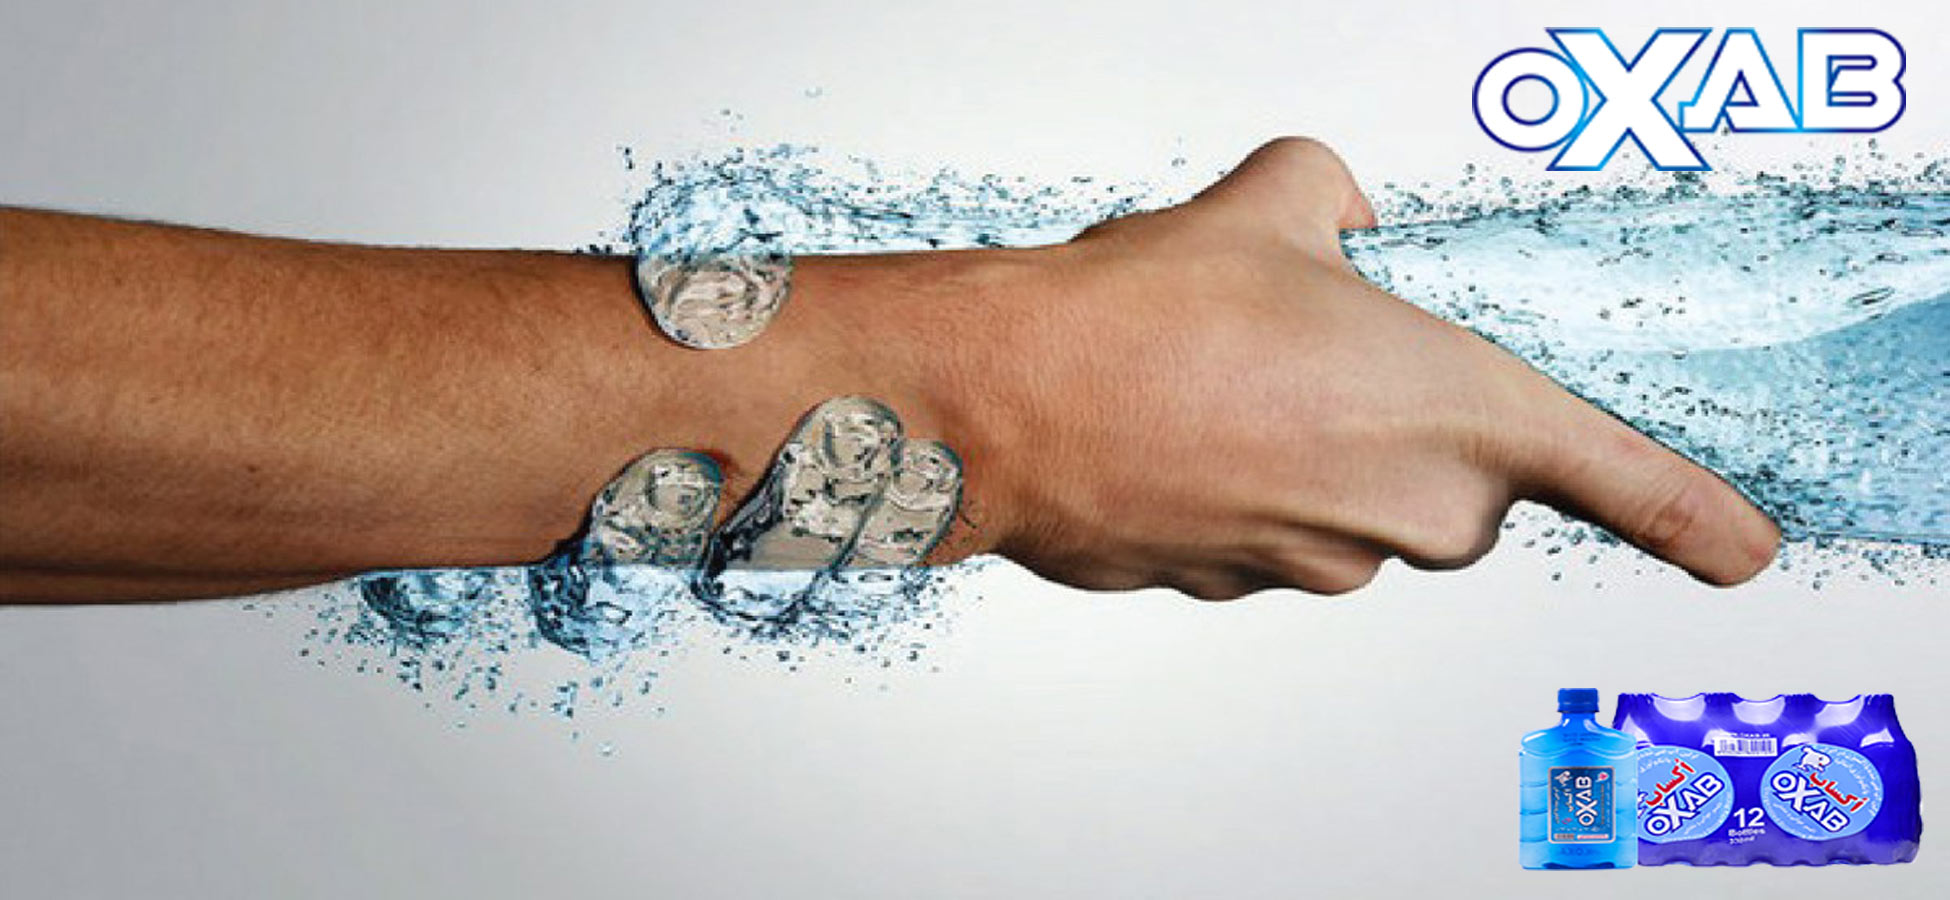 ۱۲ نشانه کم آبی بدن